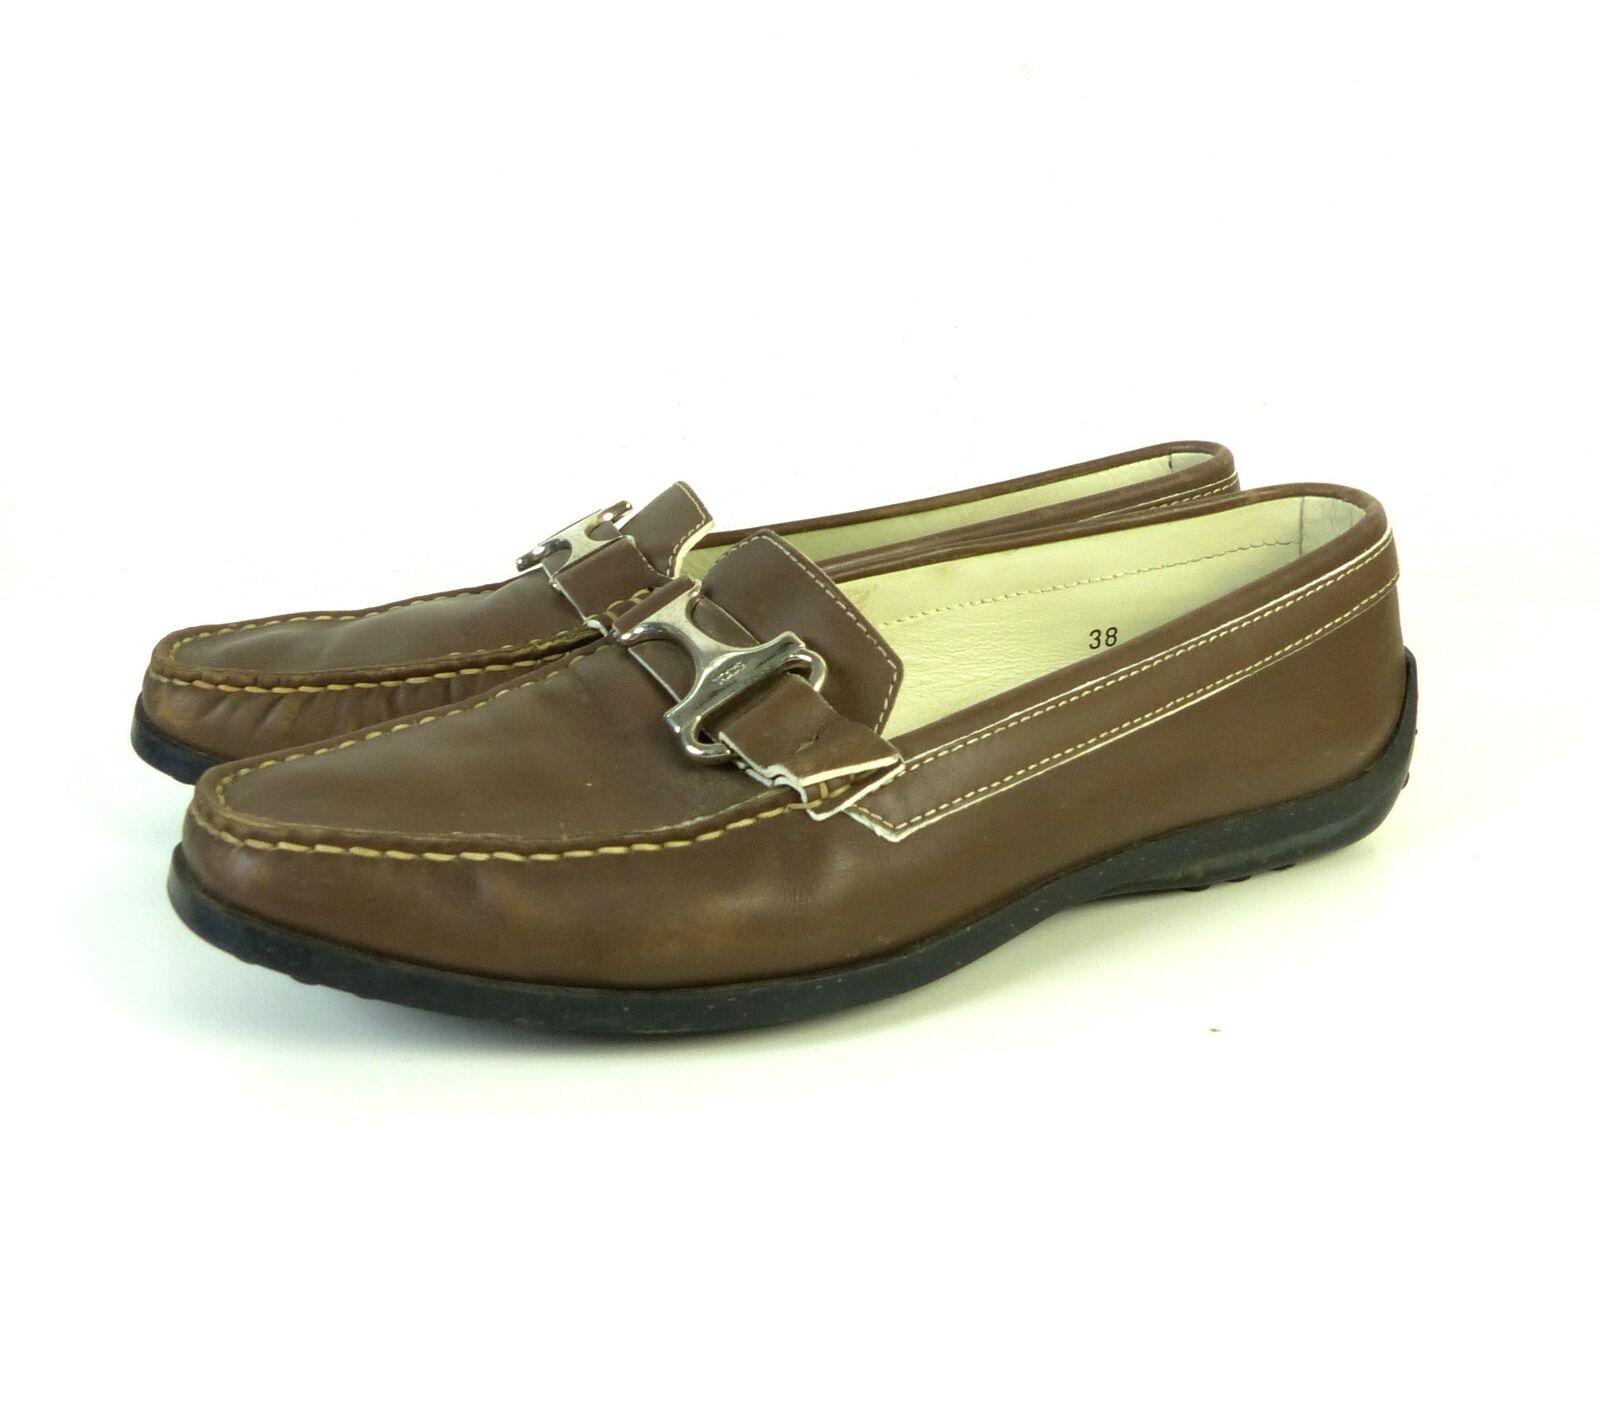 TOD's loafer mocassini ballerine MarroneeE PELLE scarpe Mis. EUR 38 (dw45)